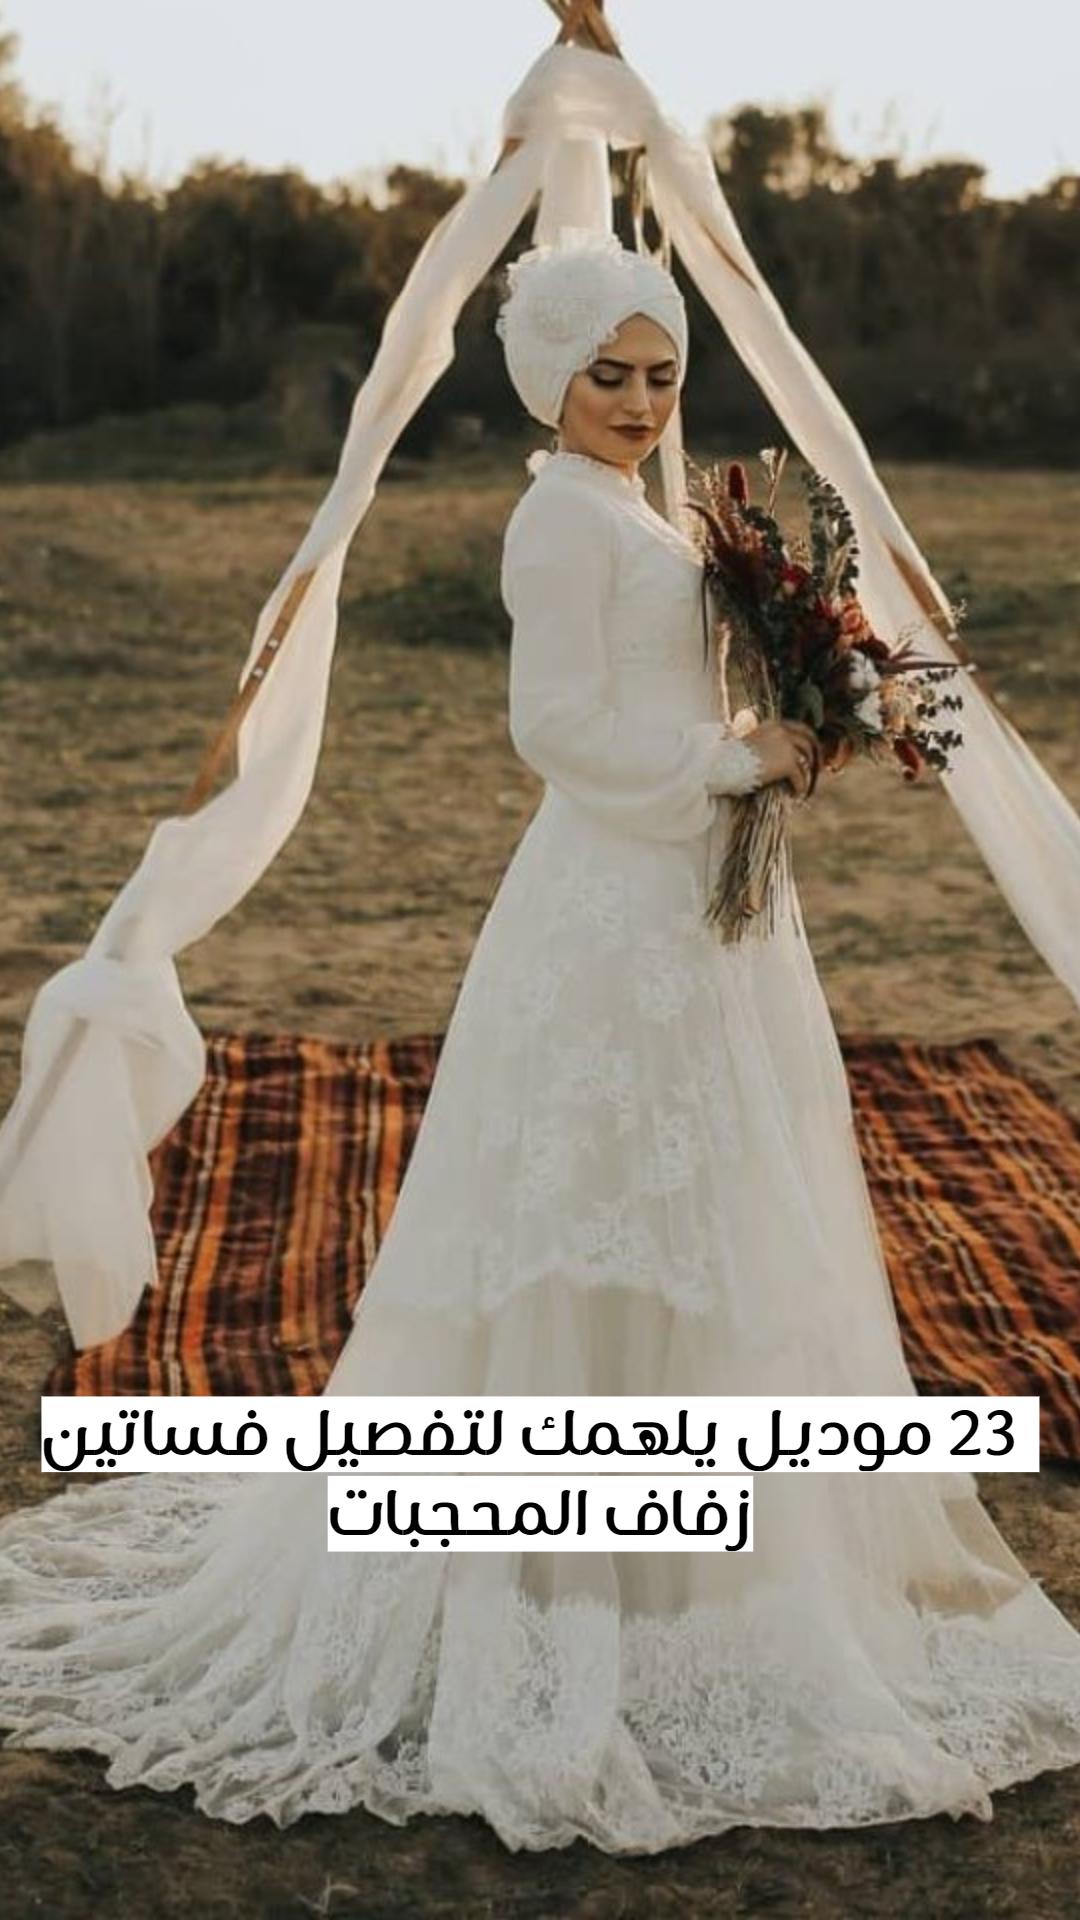 ٣٠ موديل يلهمك لتفصيل فساتين أفراح المحجبات Wedding Dresses One Shoulder Wedding Dress Dresses